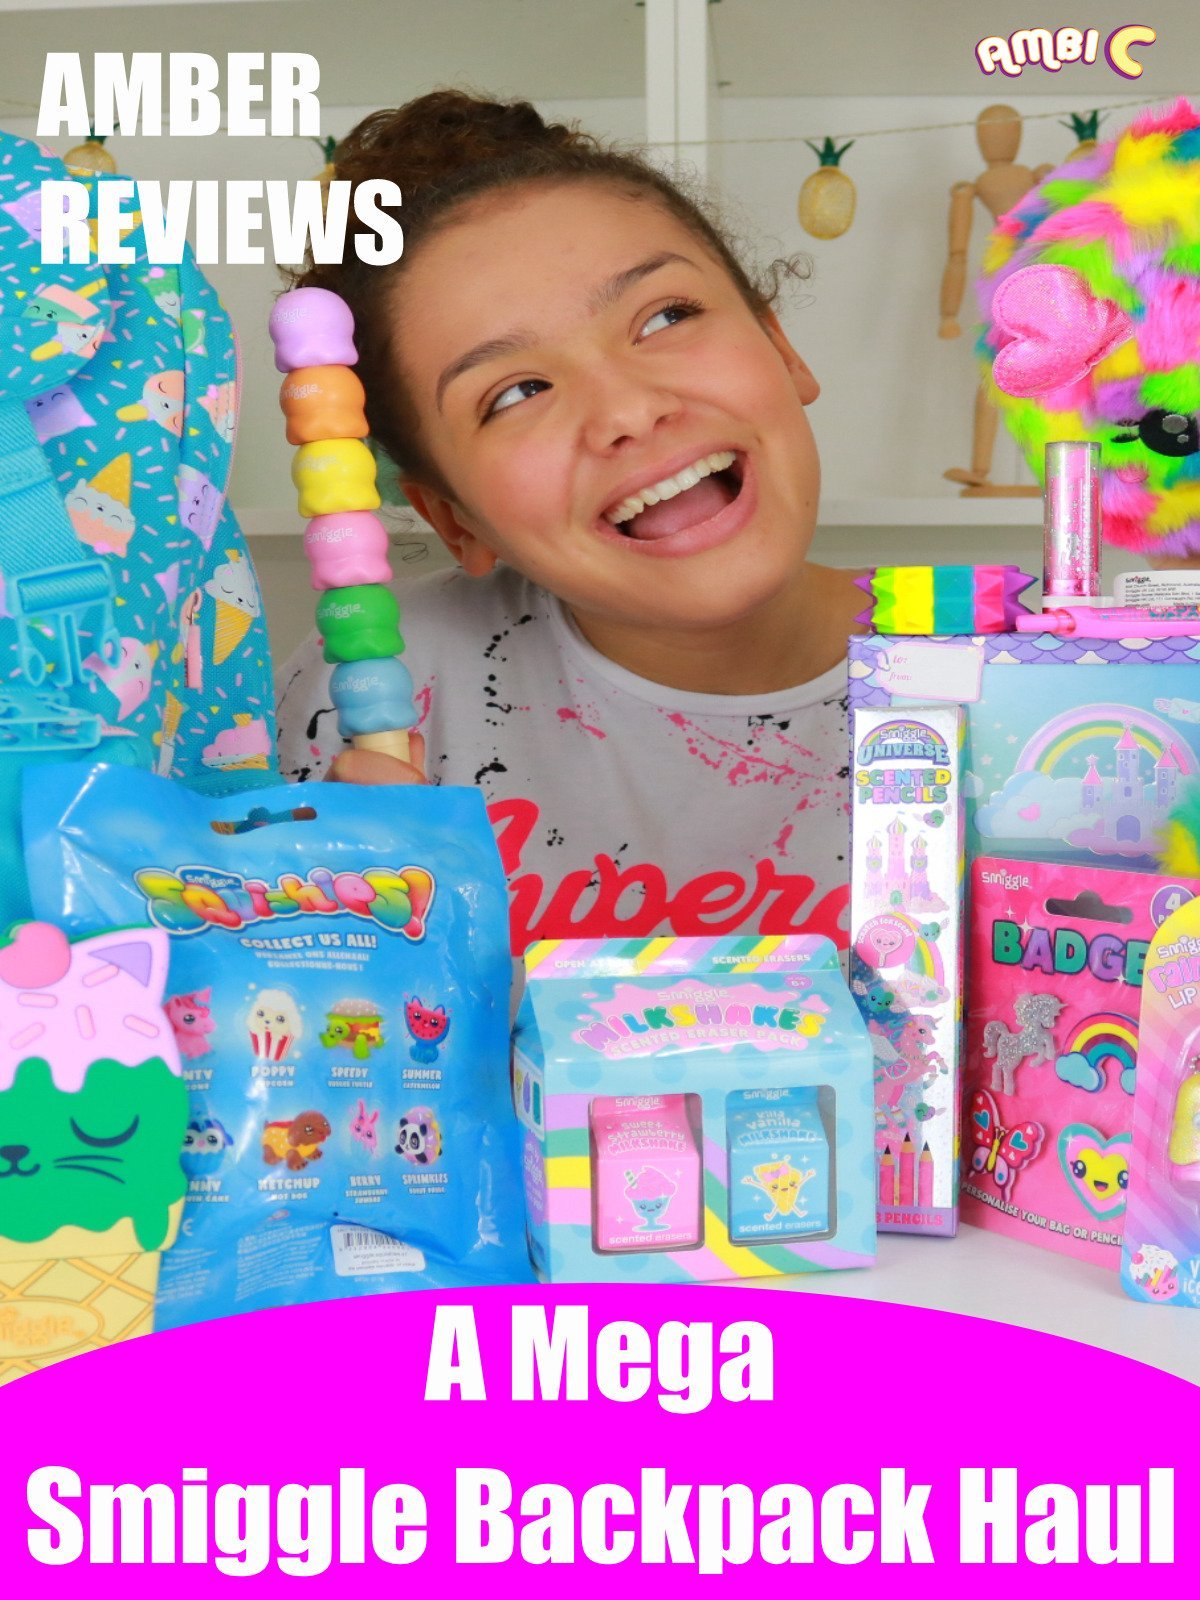 Amber Reviews a Mega Smiggle Backpack Haul